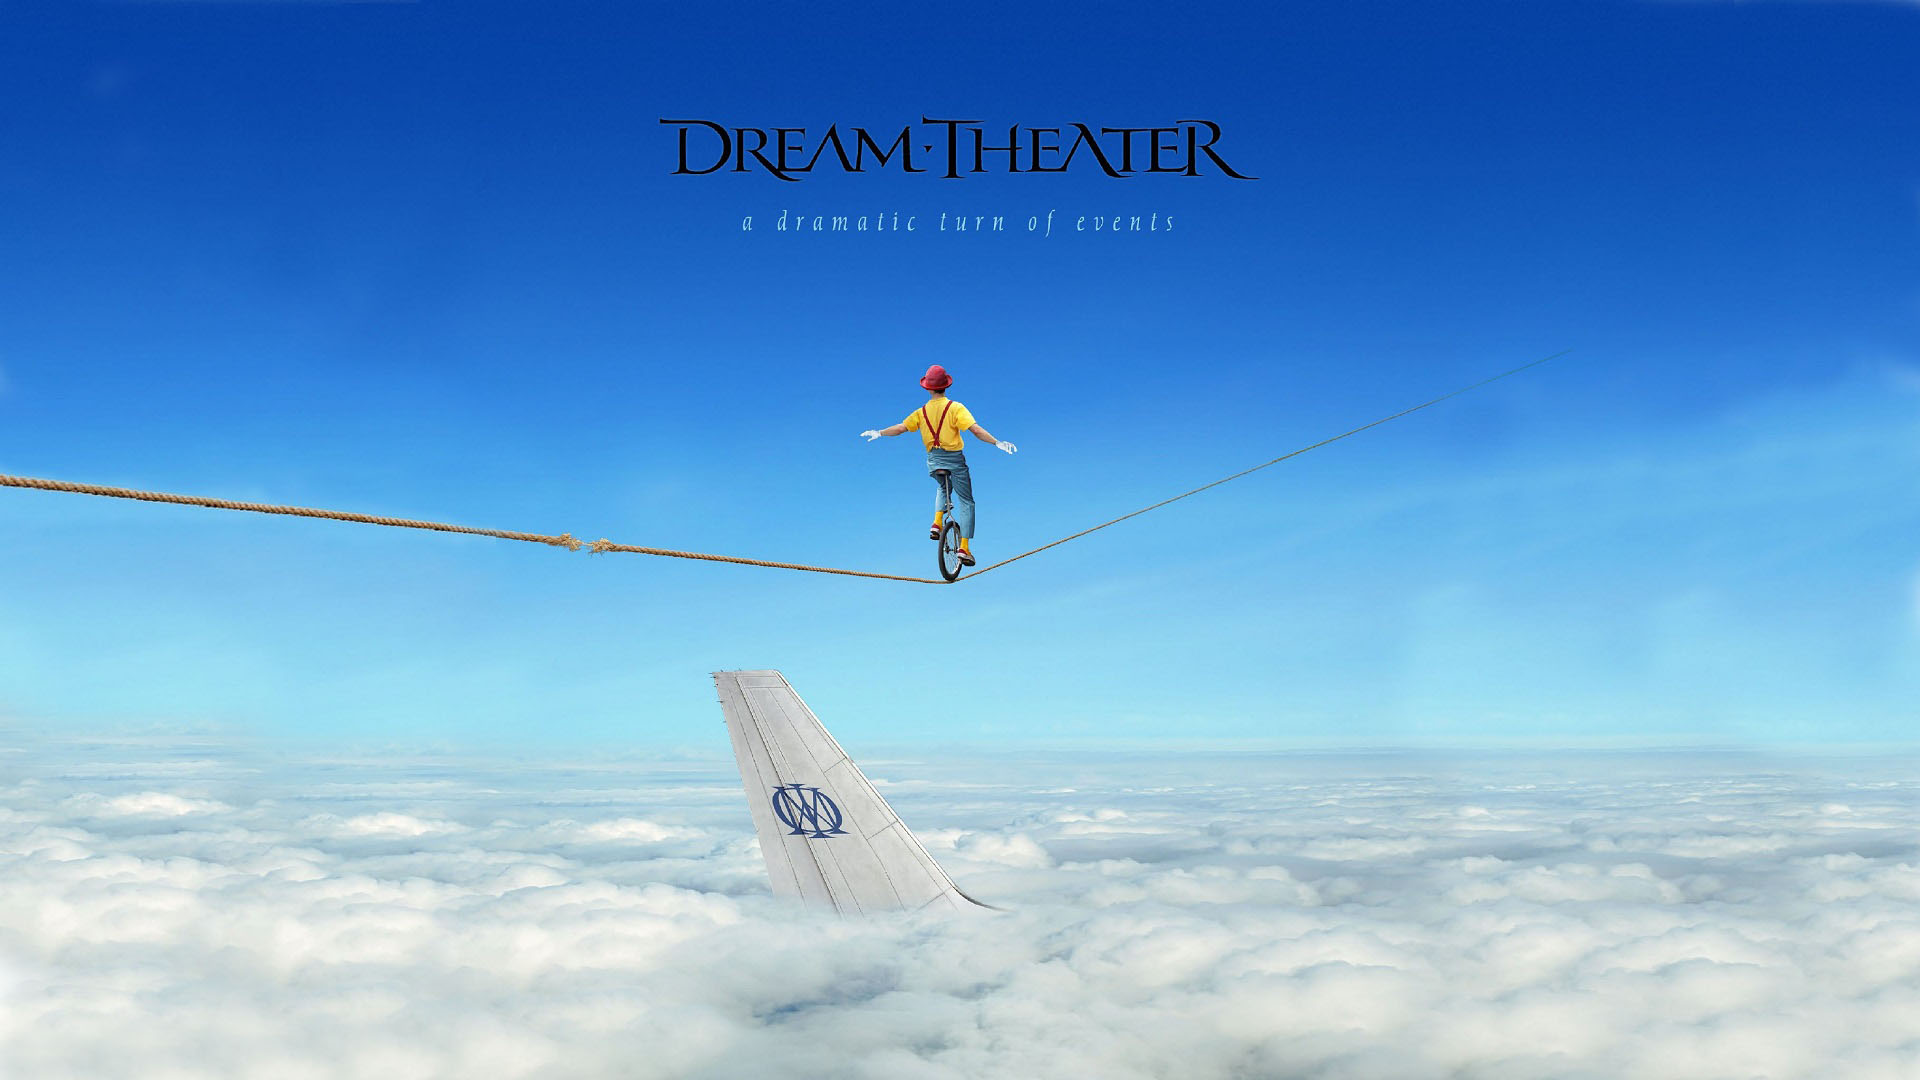 dream theater wallpaper